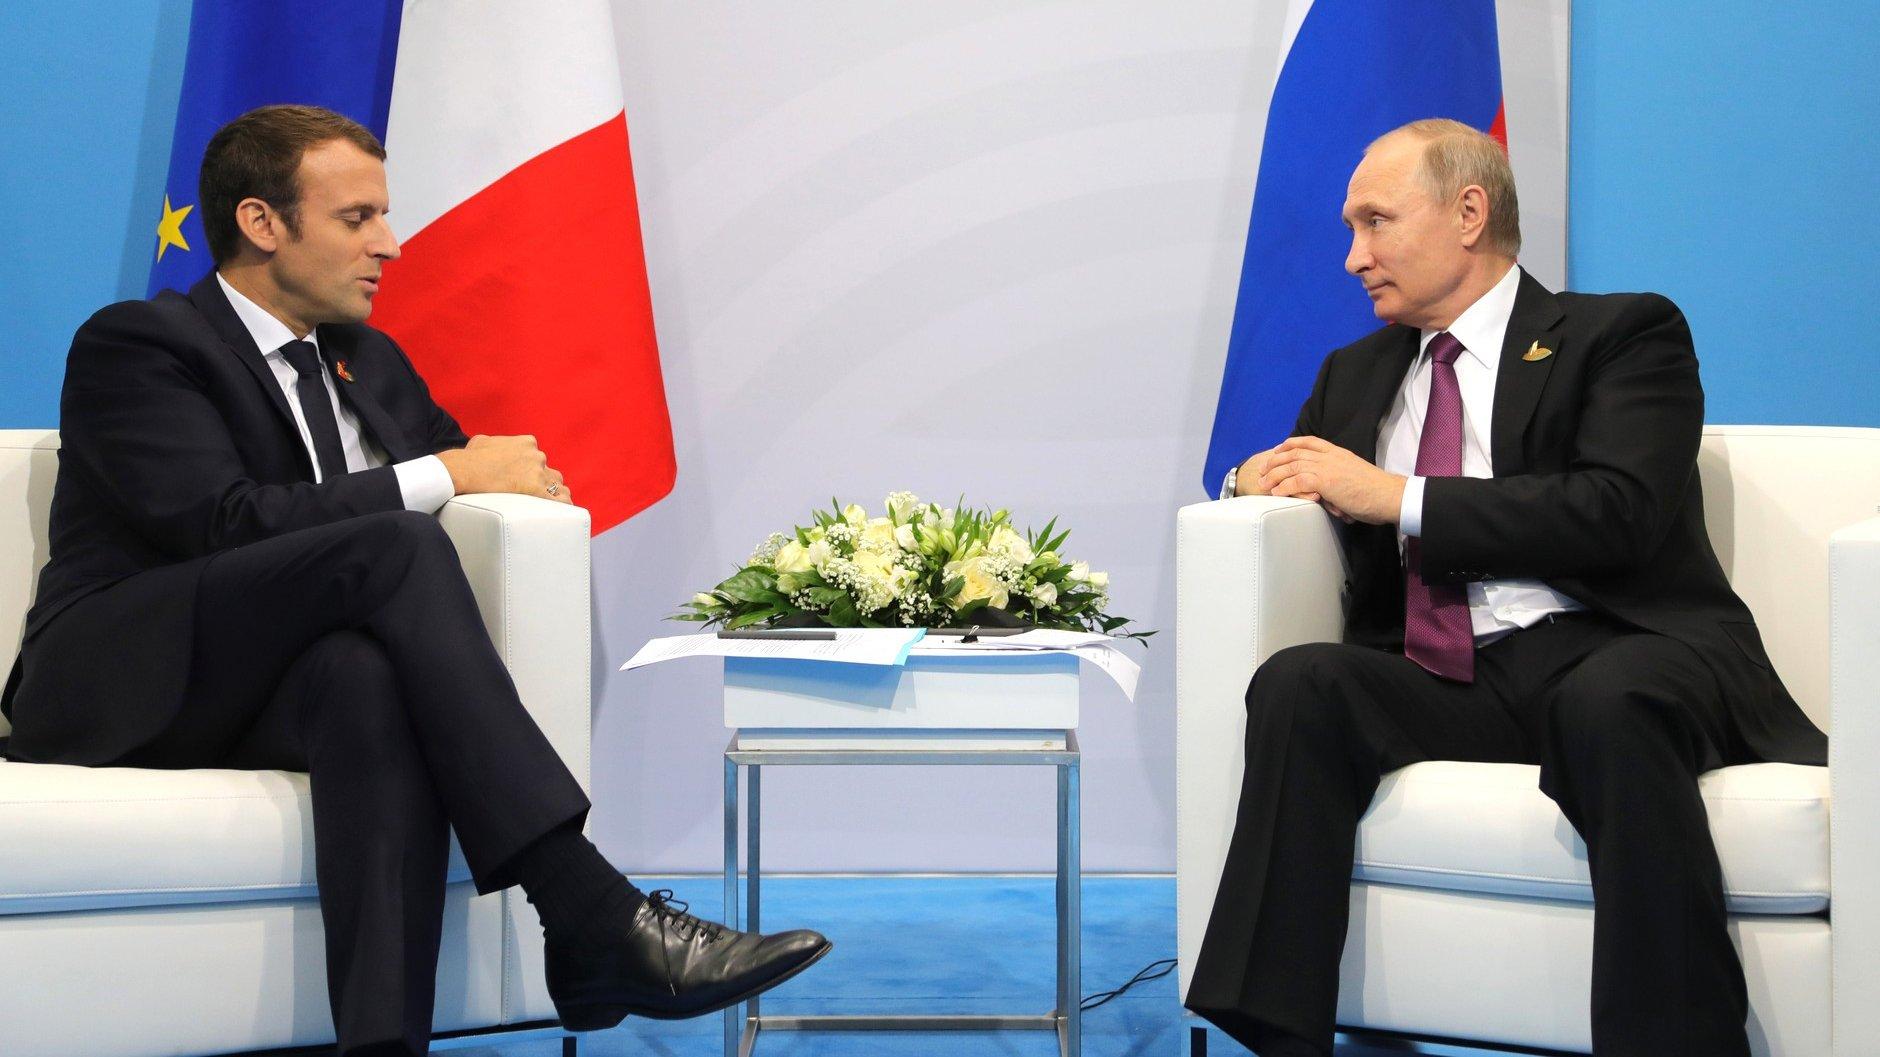 Путин обсудил с Макроном ситуацию на Украине и в Сирии